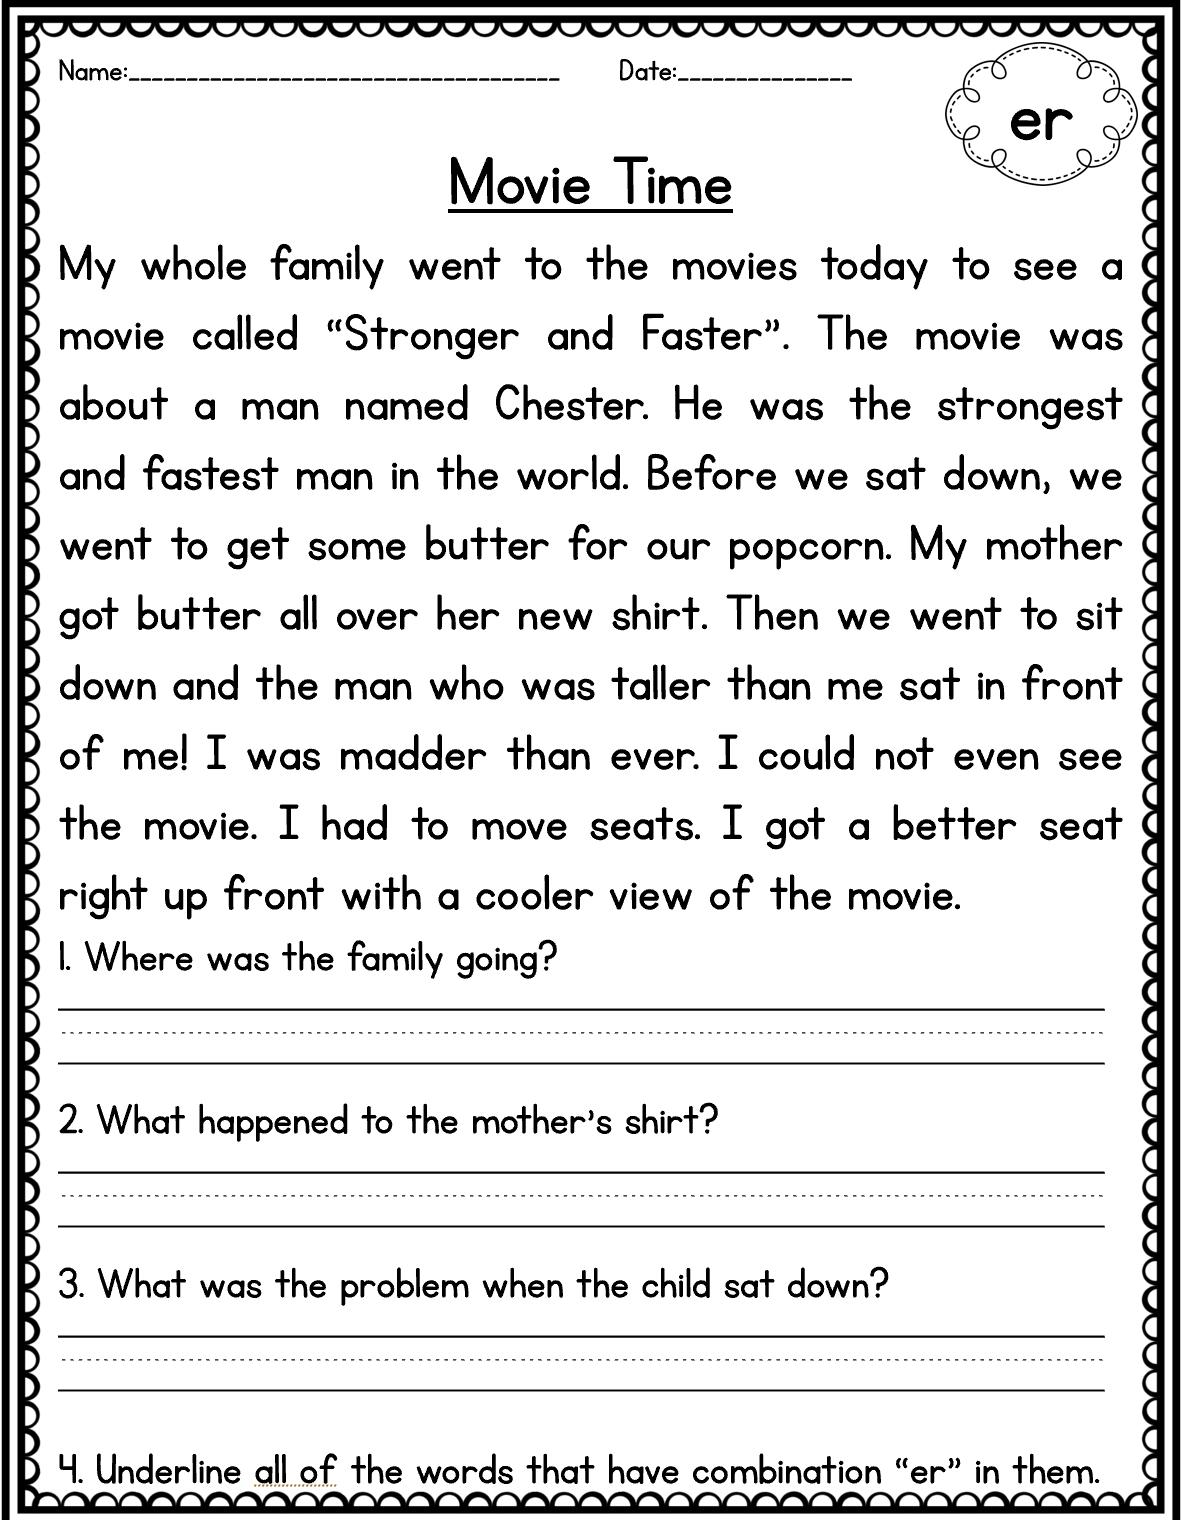 Phonics Passage Reading Comprehension For Kids Reading Comprehension Texts Reading Comprehension Passages [ 1520 x 1181 Pixel ]